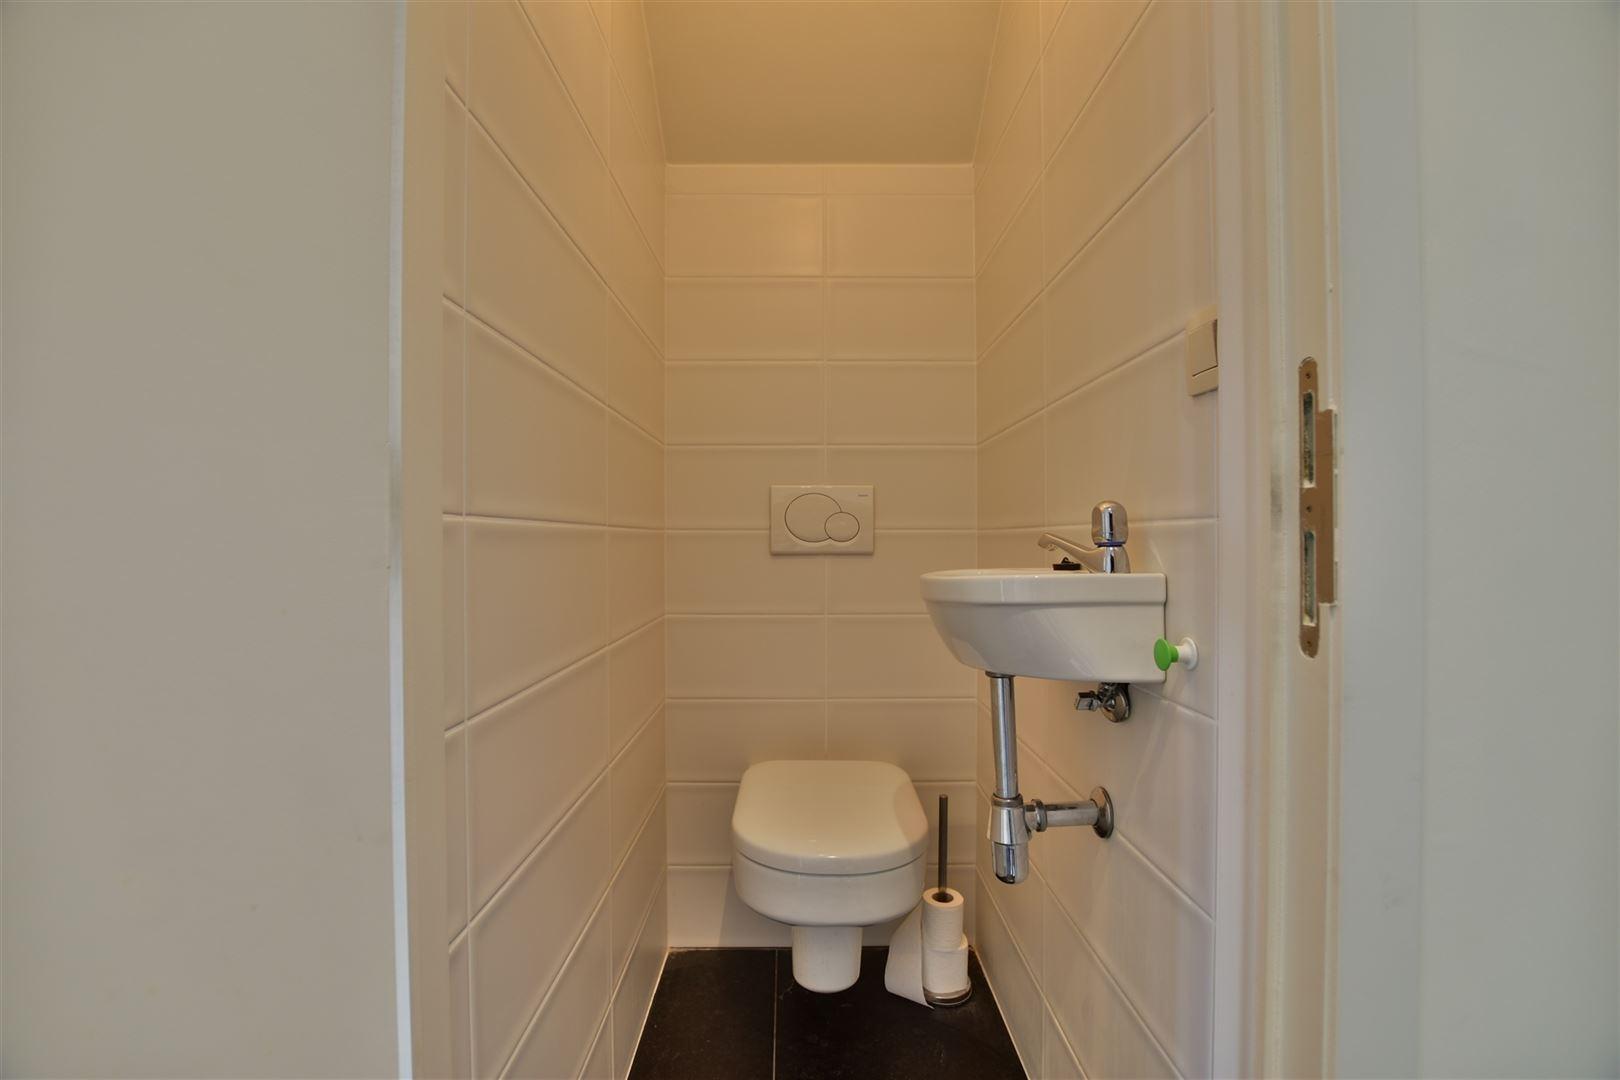 Foto 14 : Duplex/Penthouse te 9200 Sint-Gillis-bij-Dendermonde (België) - Prijs € 278.000